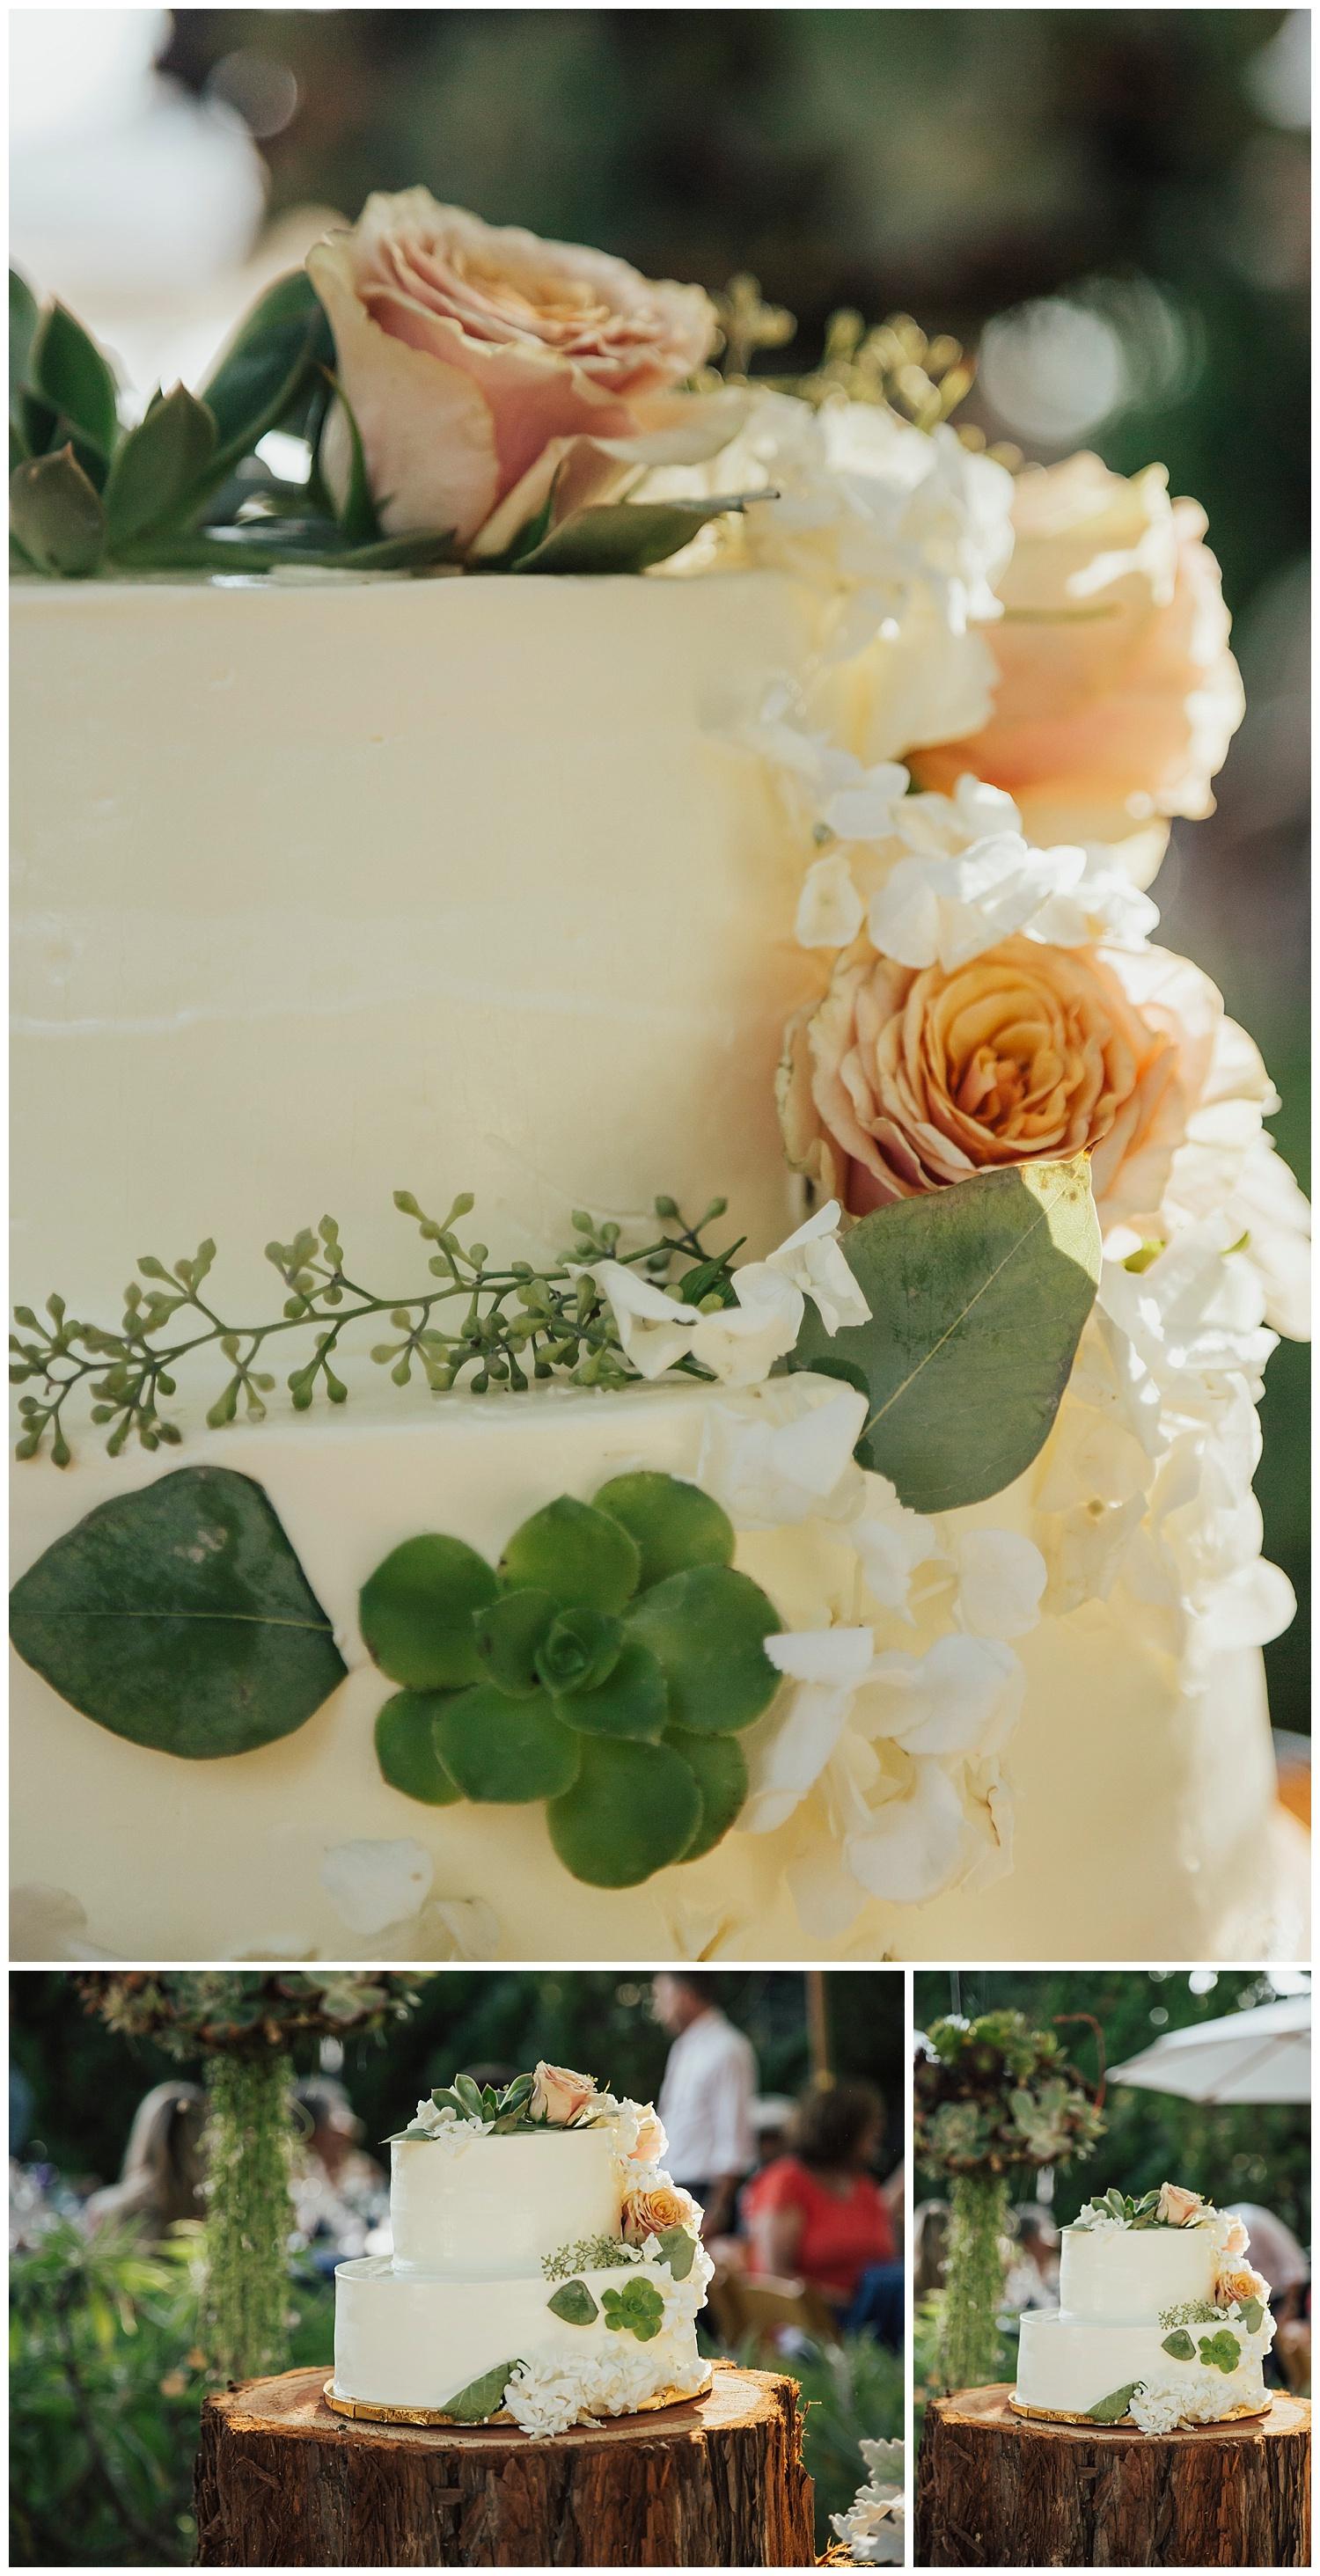 big-sur-summer-wedding-cake-carol-oliva-photography.jpg